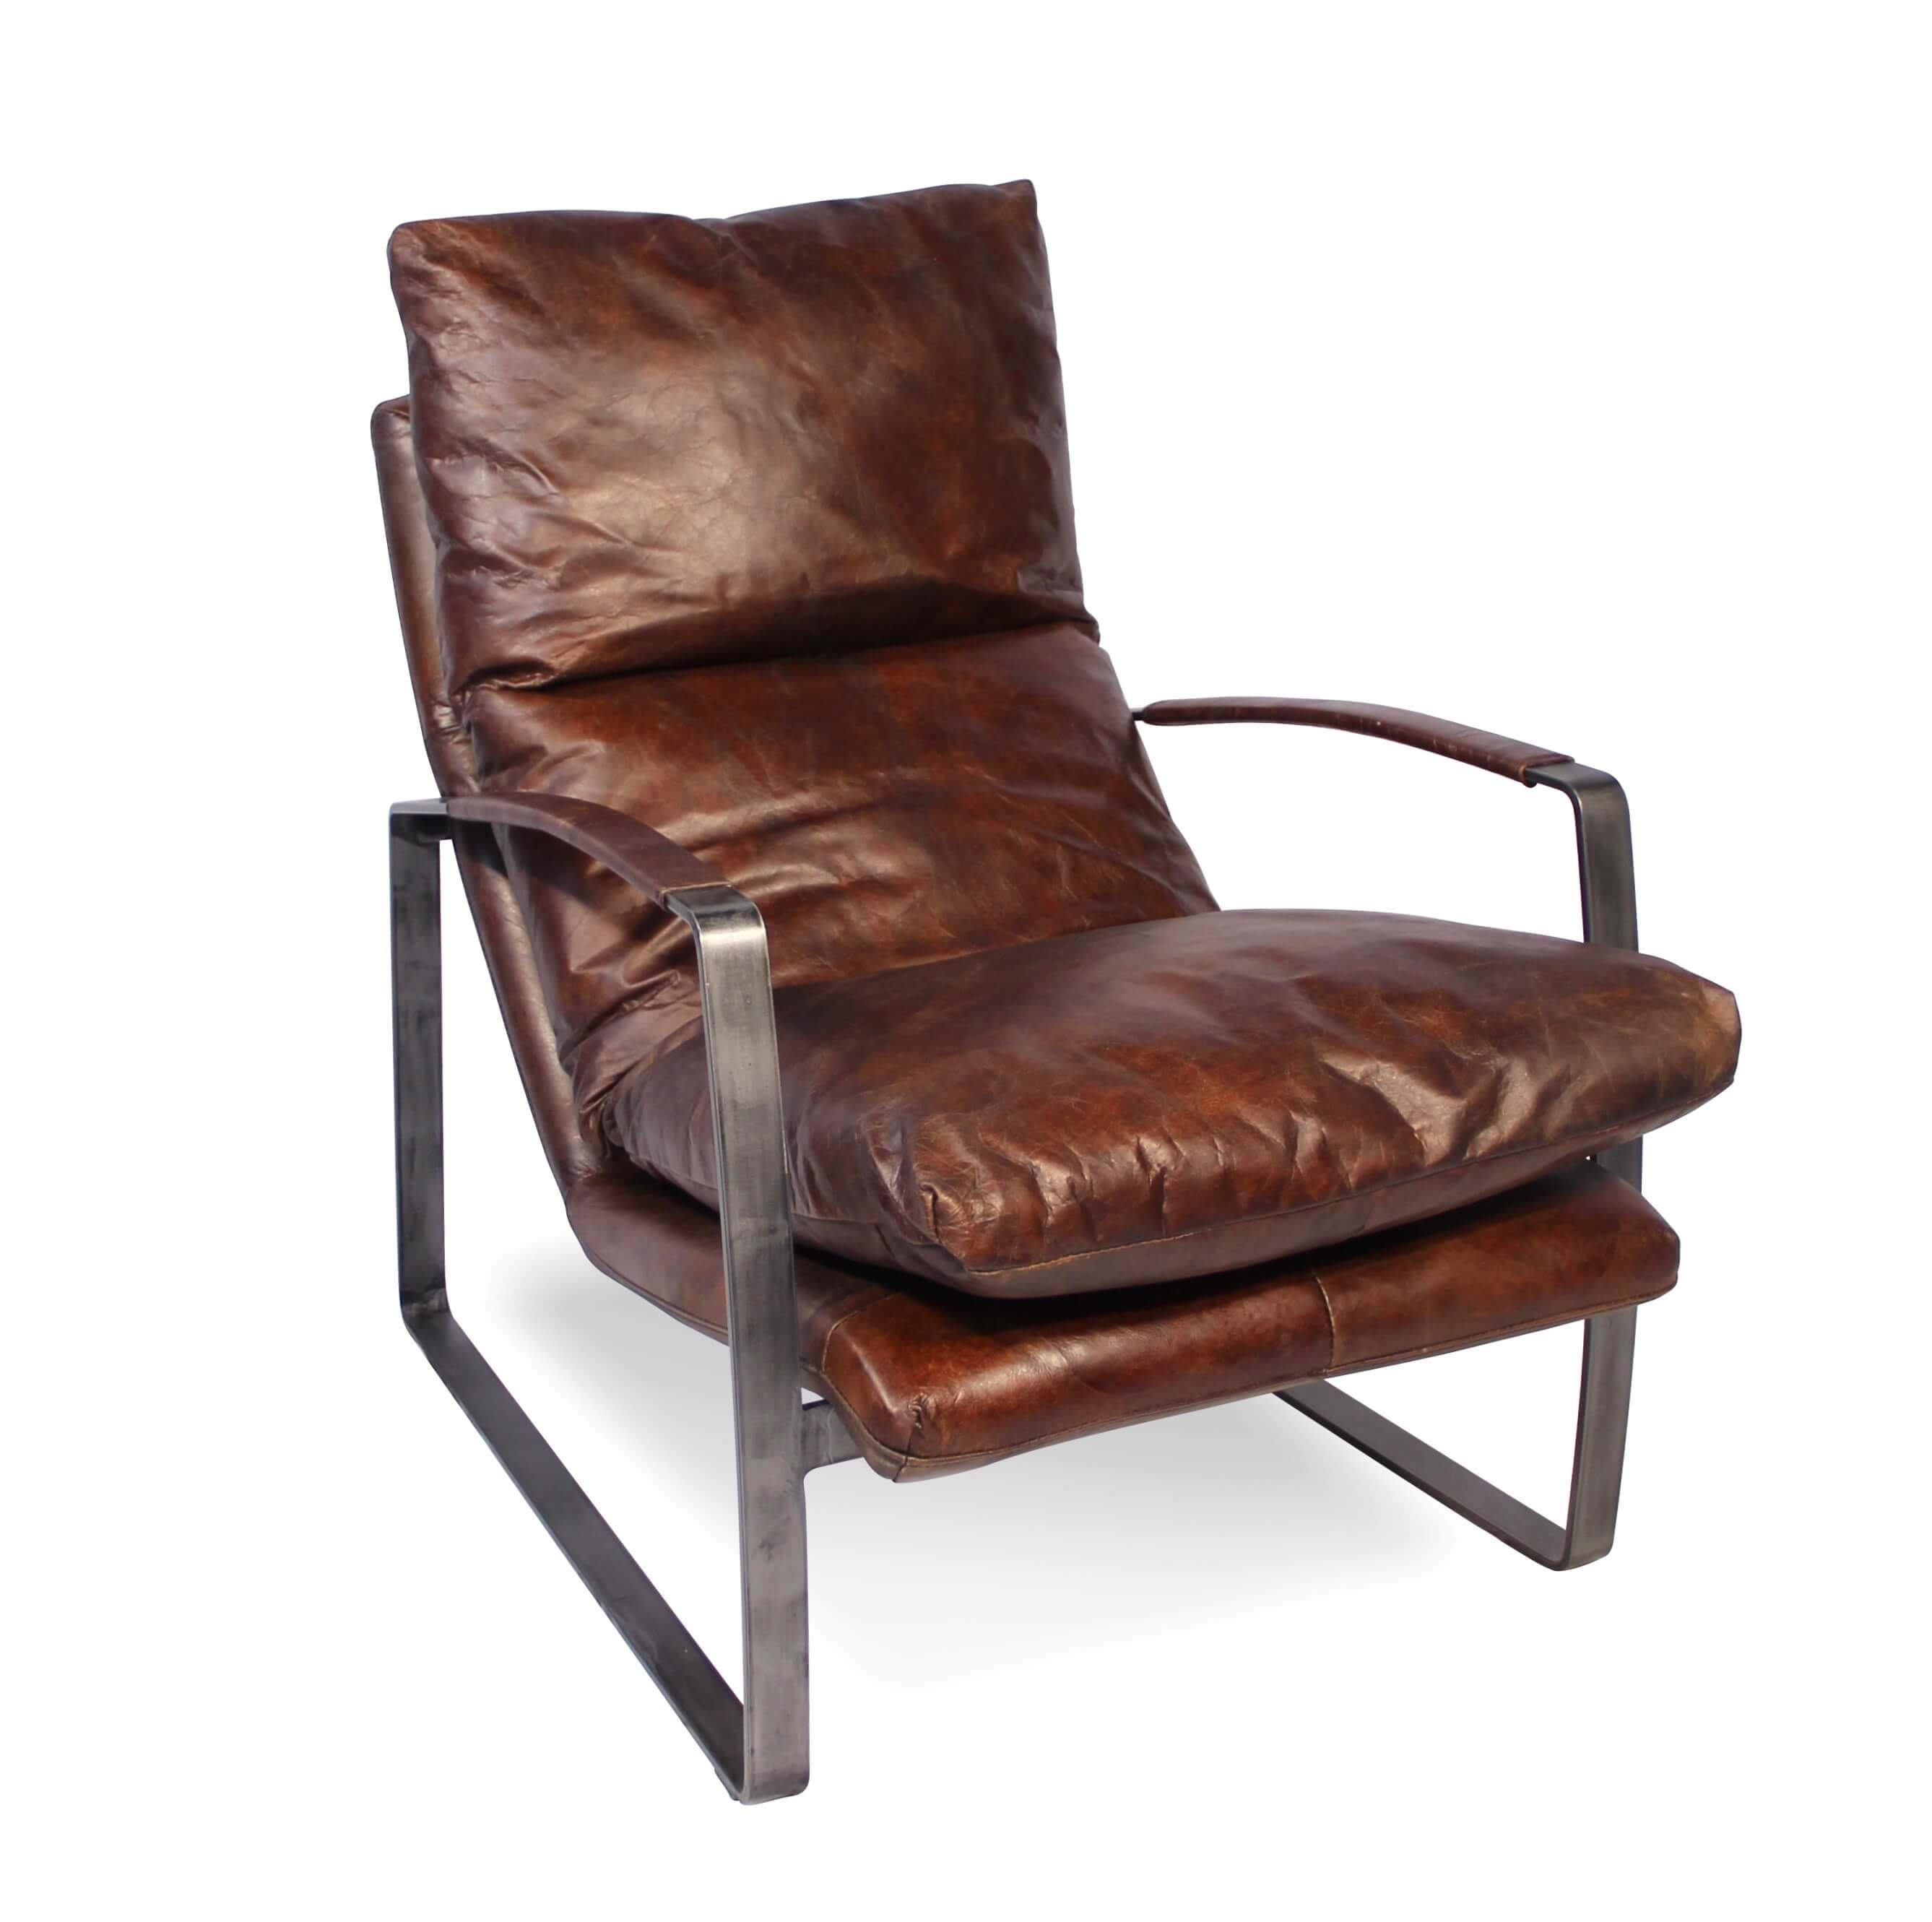 Sessel In Patina vintage Braun Leder und Metall sechziger